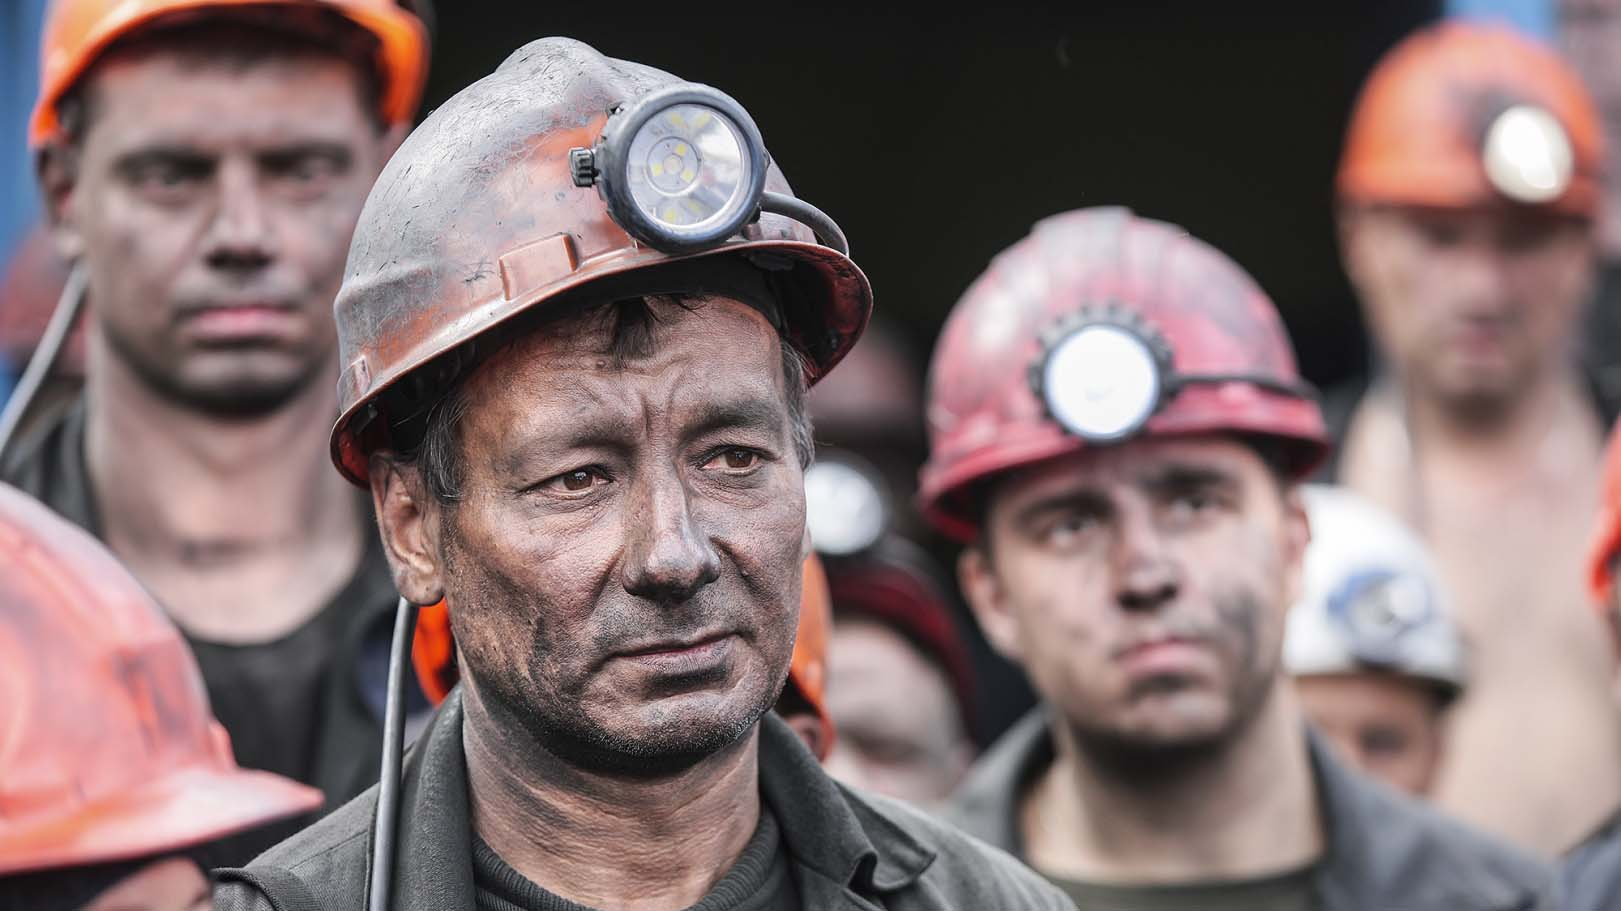 Картинки шахтеров донбасса